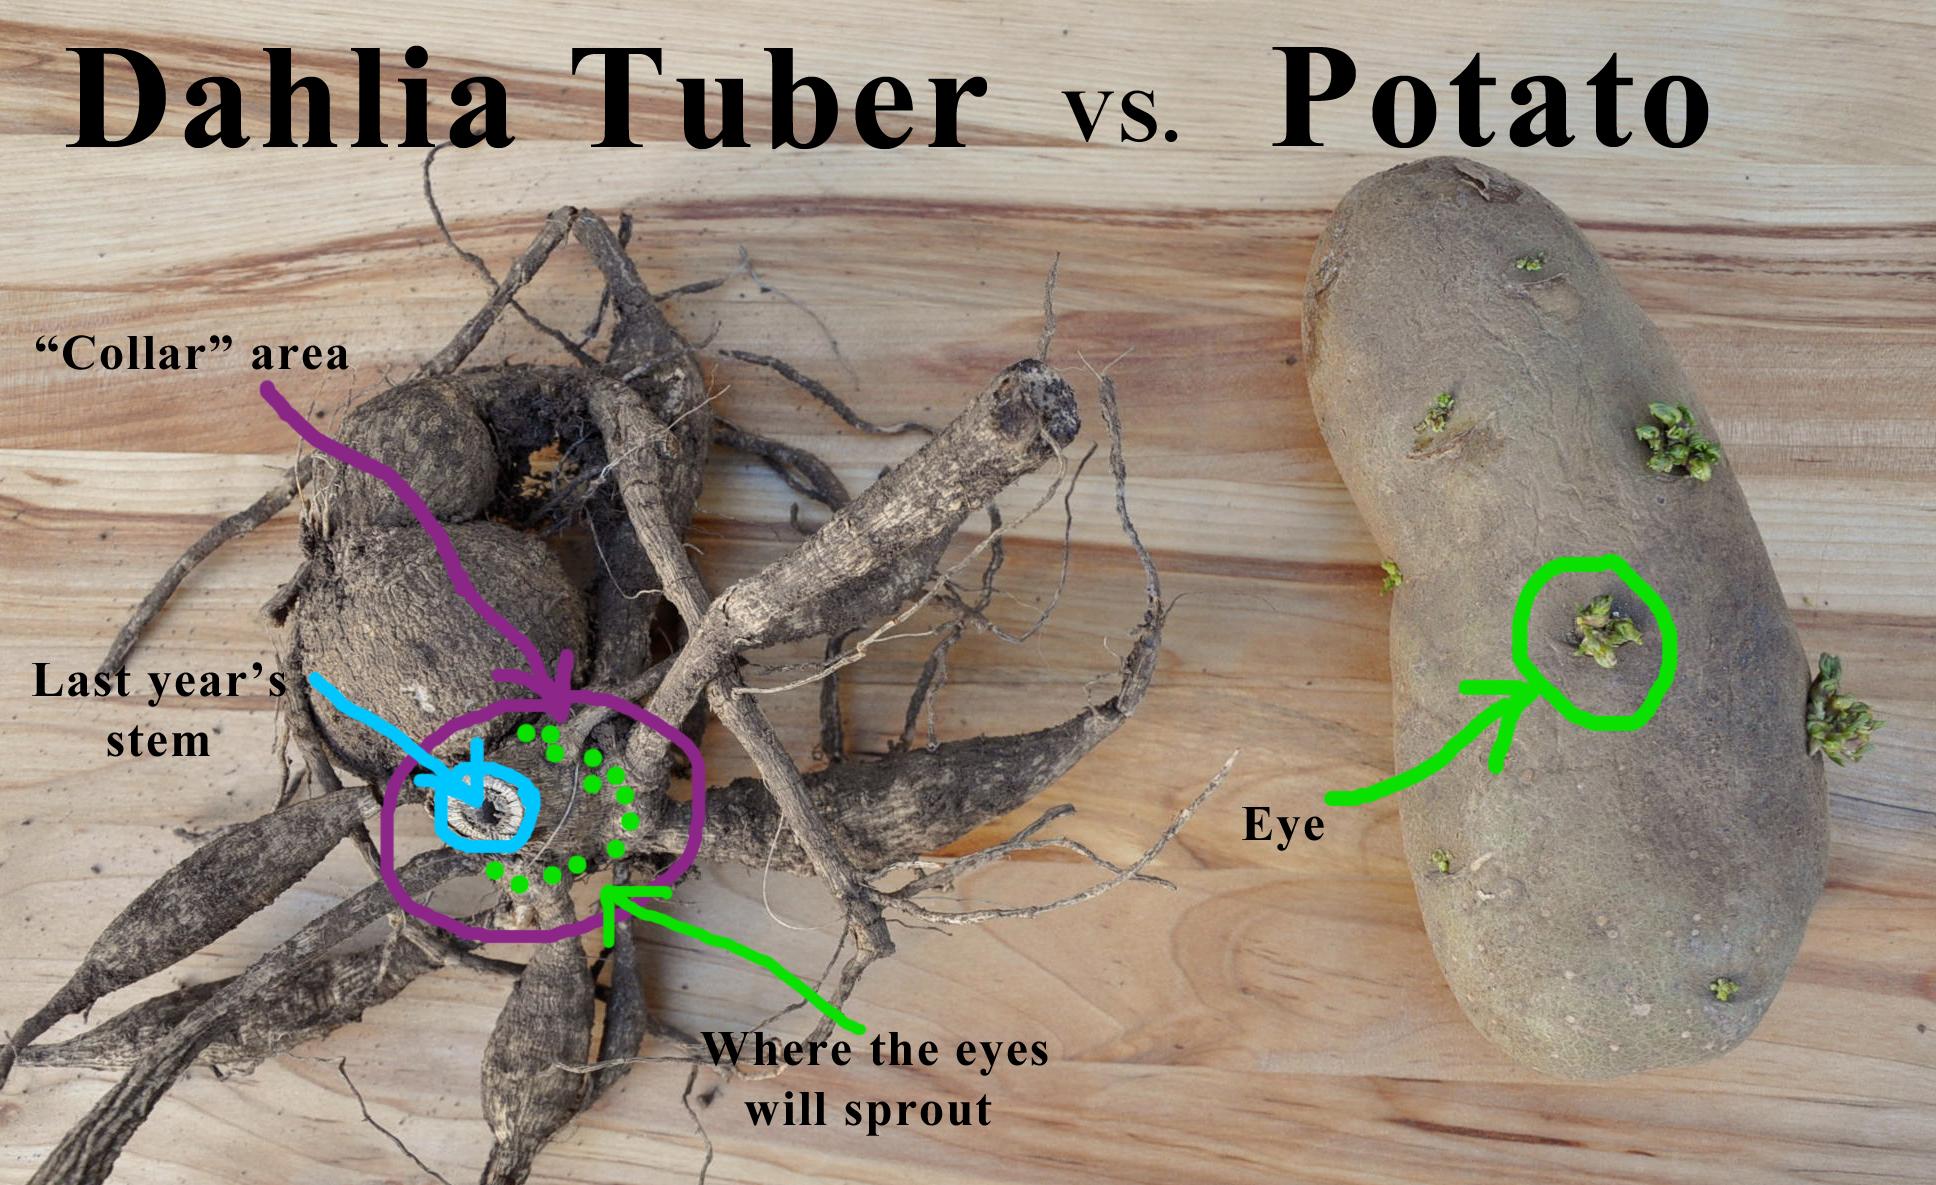 Dahlia tuber compared to potato